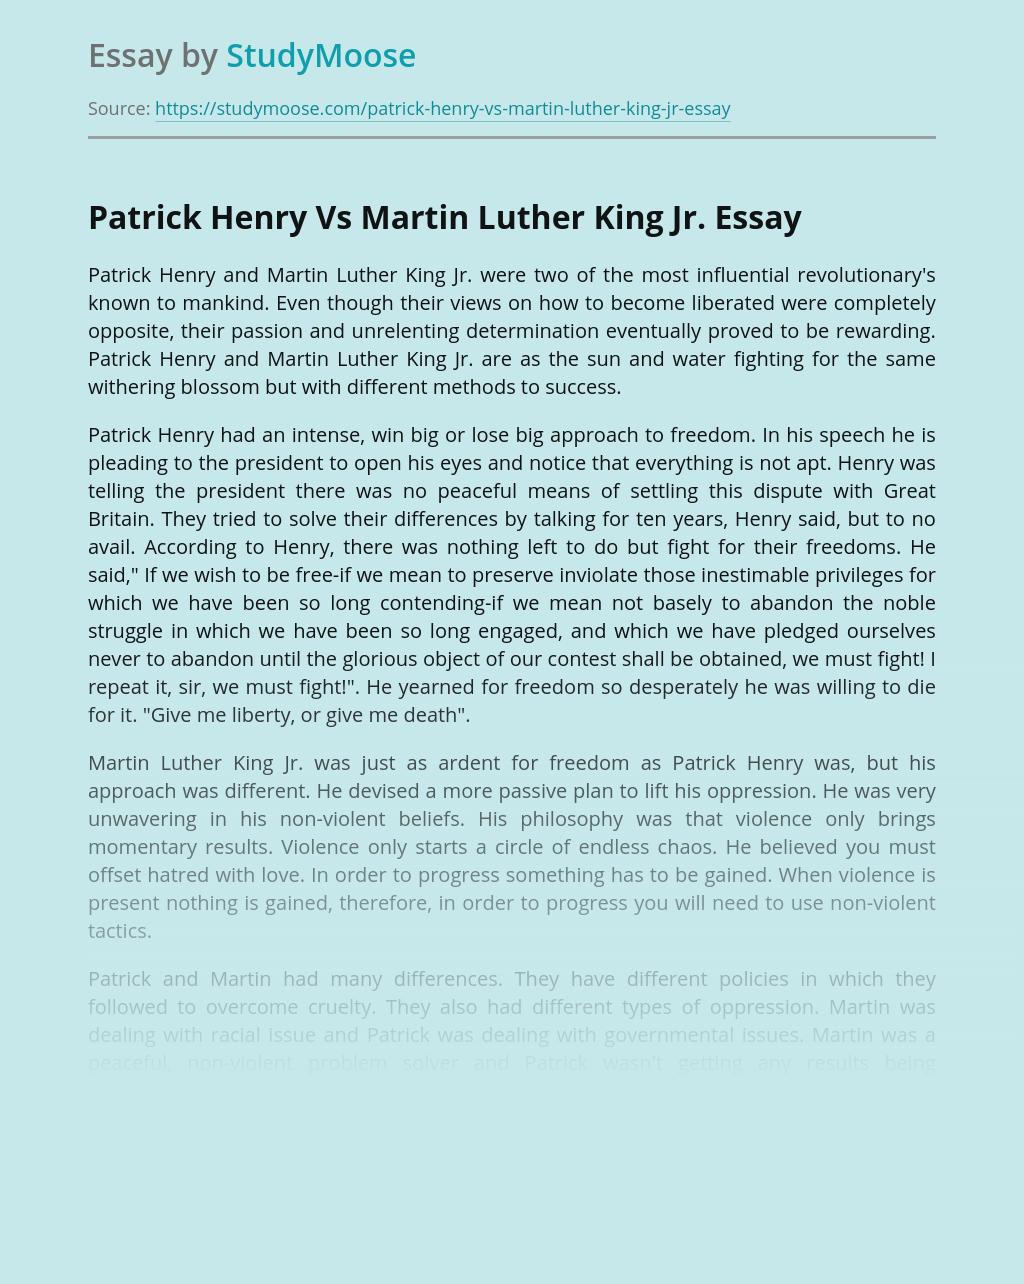 Patrick Henry Vs Martin Luther King Jr.